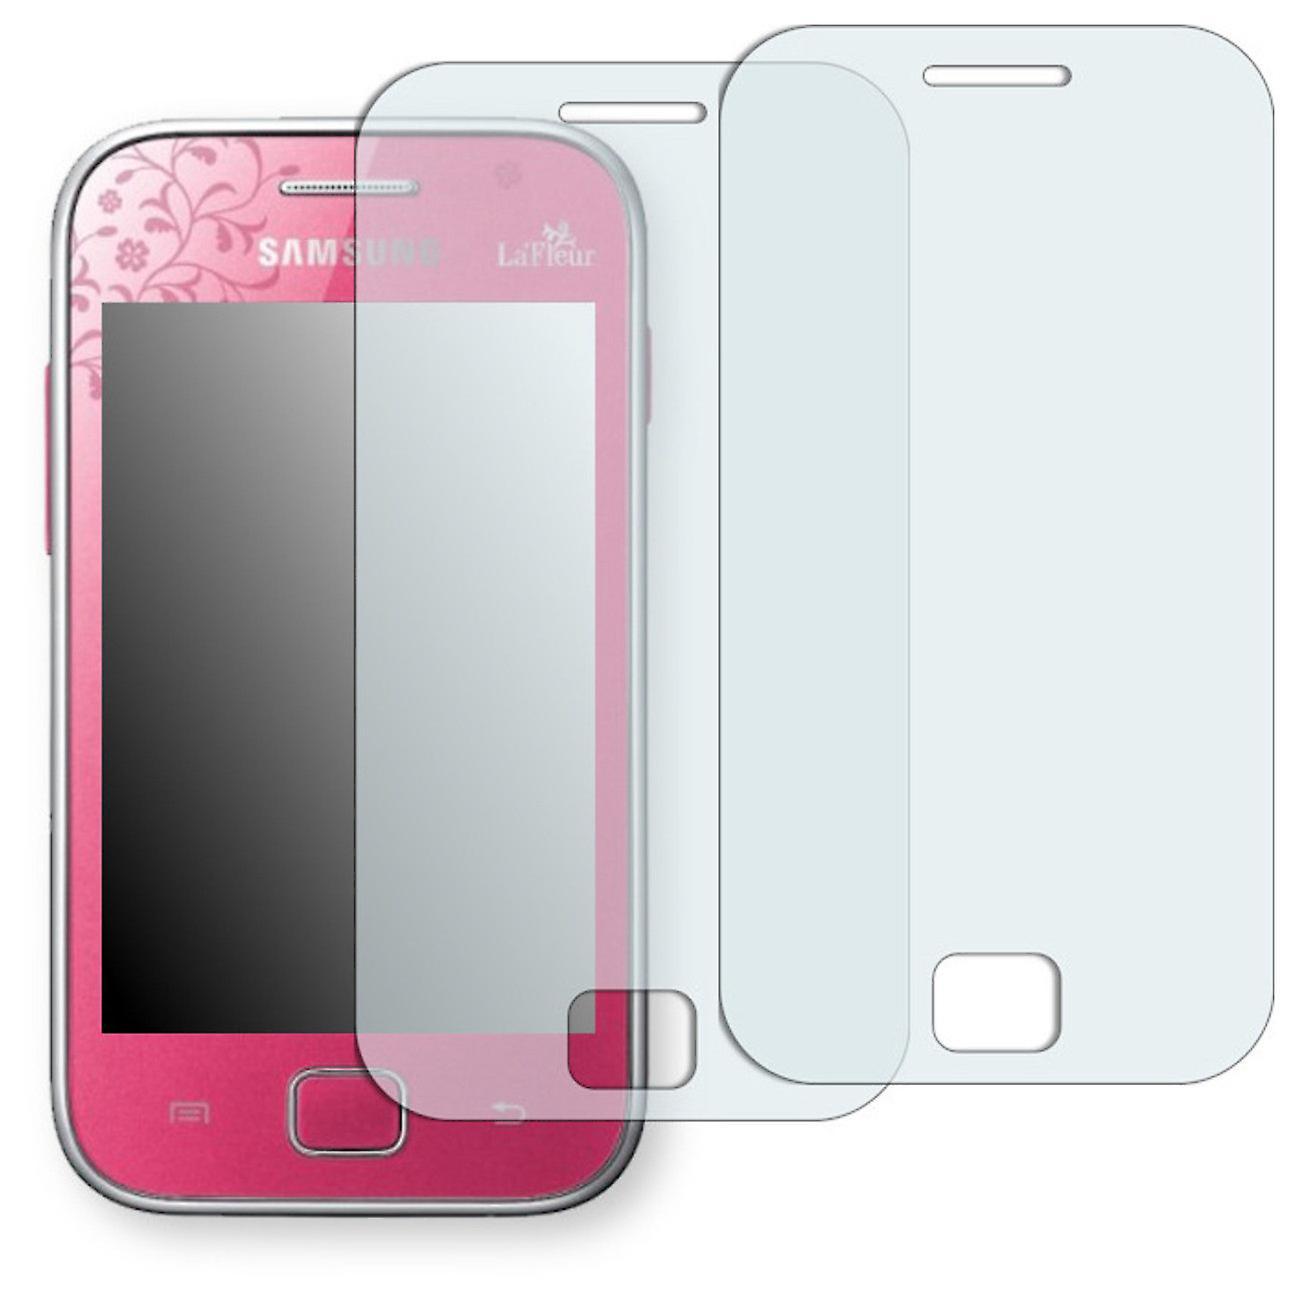 Samsung S6802 Galaxy ACE duo La fleur Edition display protector -  Golebo-semi Matt protector